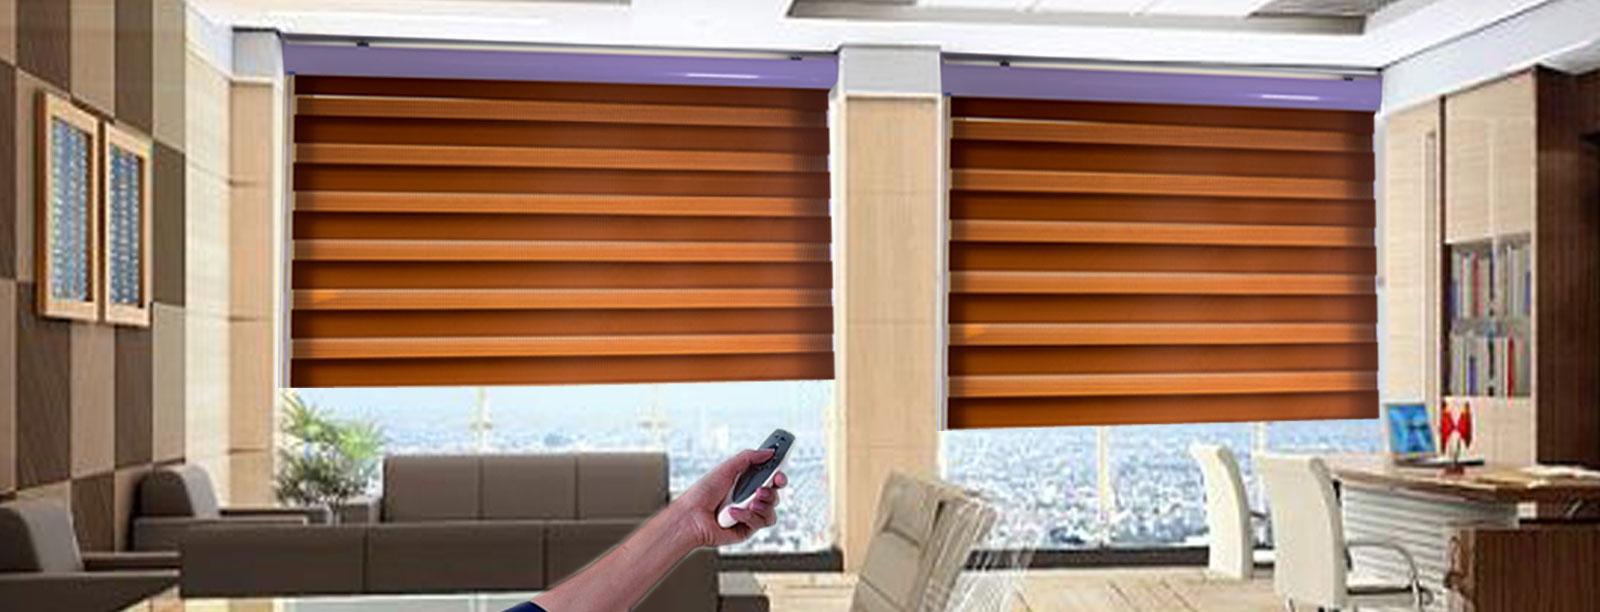 okna a rolety aranzacja